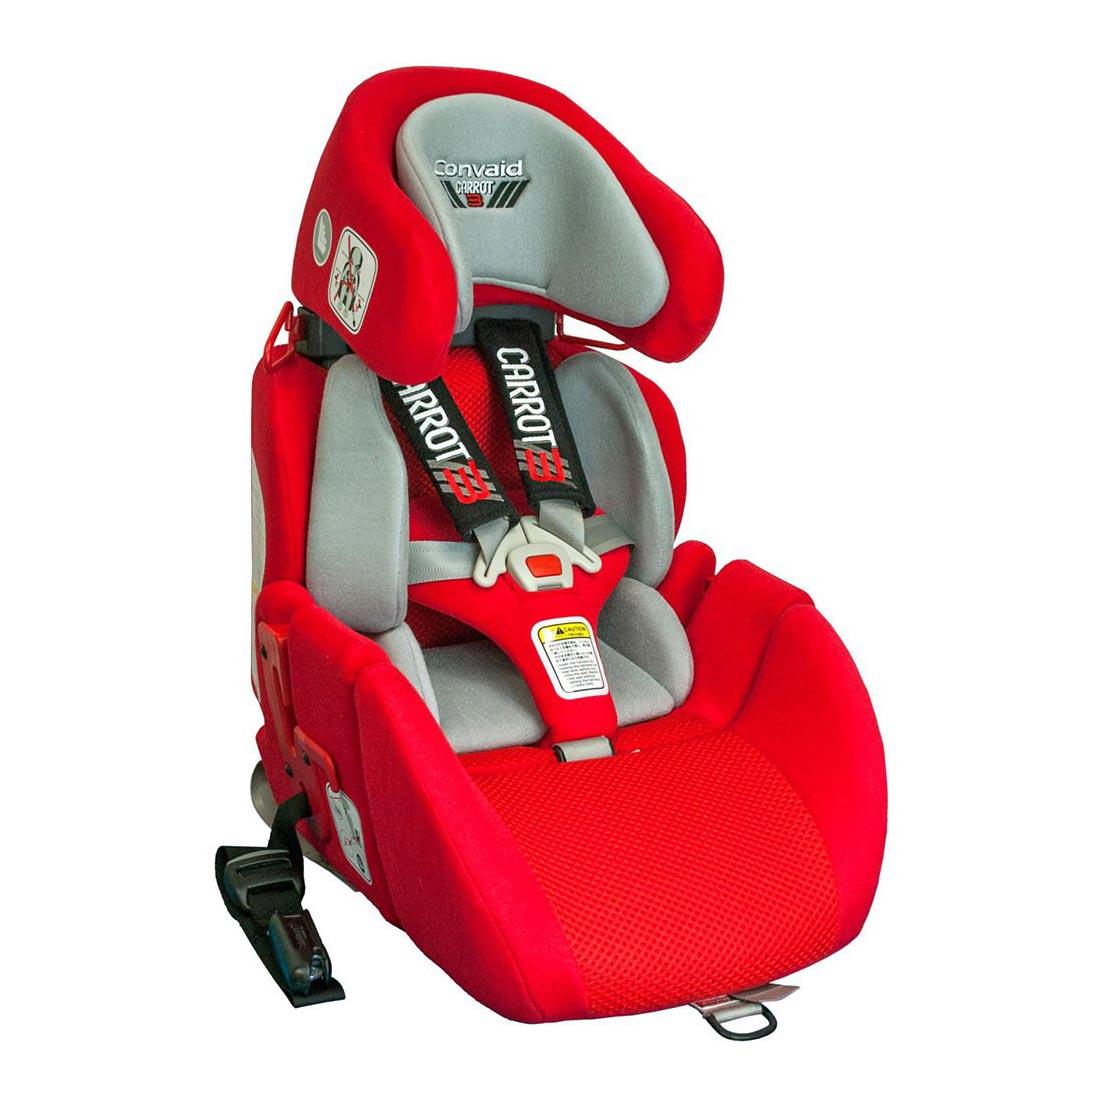 Convaid Carrot 3 car seat